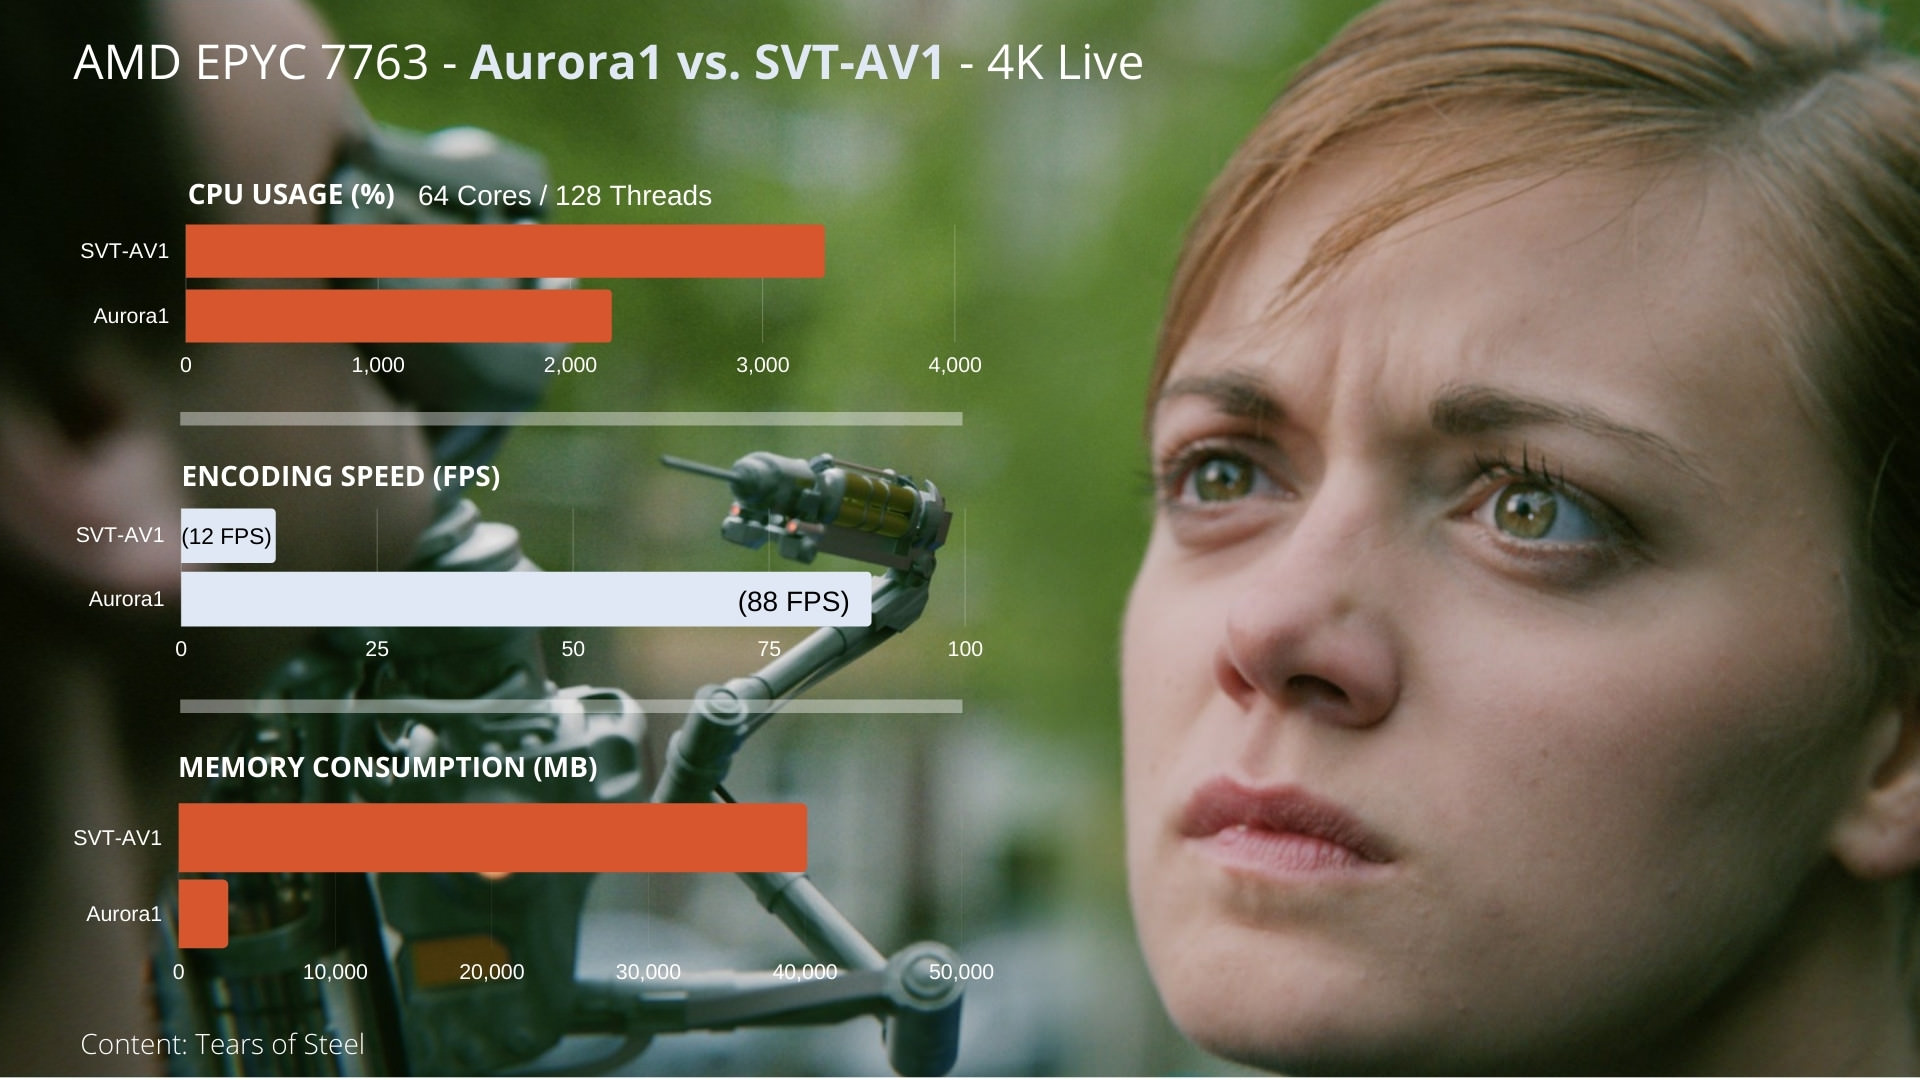 amd epyc 7763 aurora1 vs svt-av1 4k live